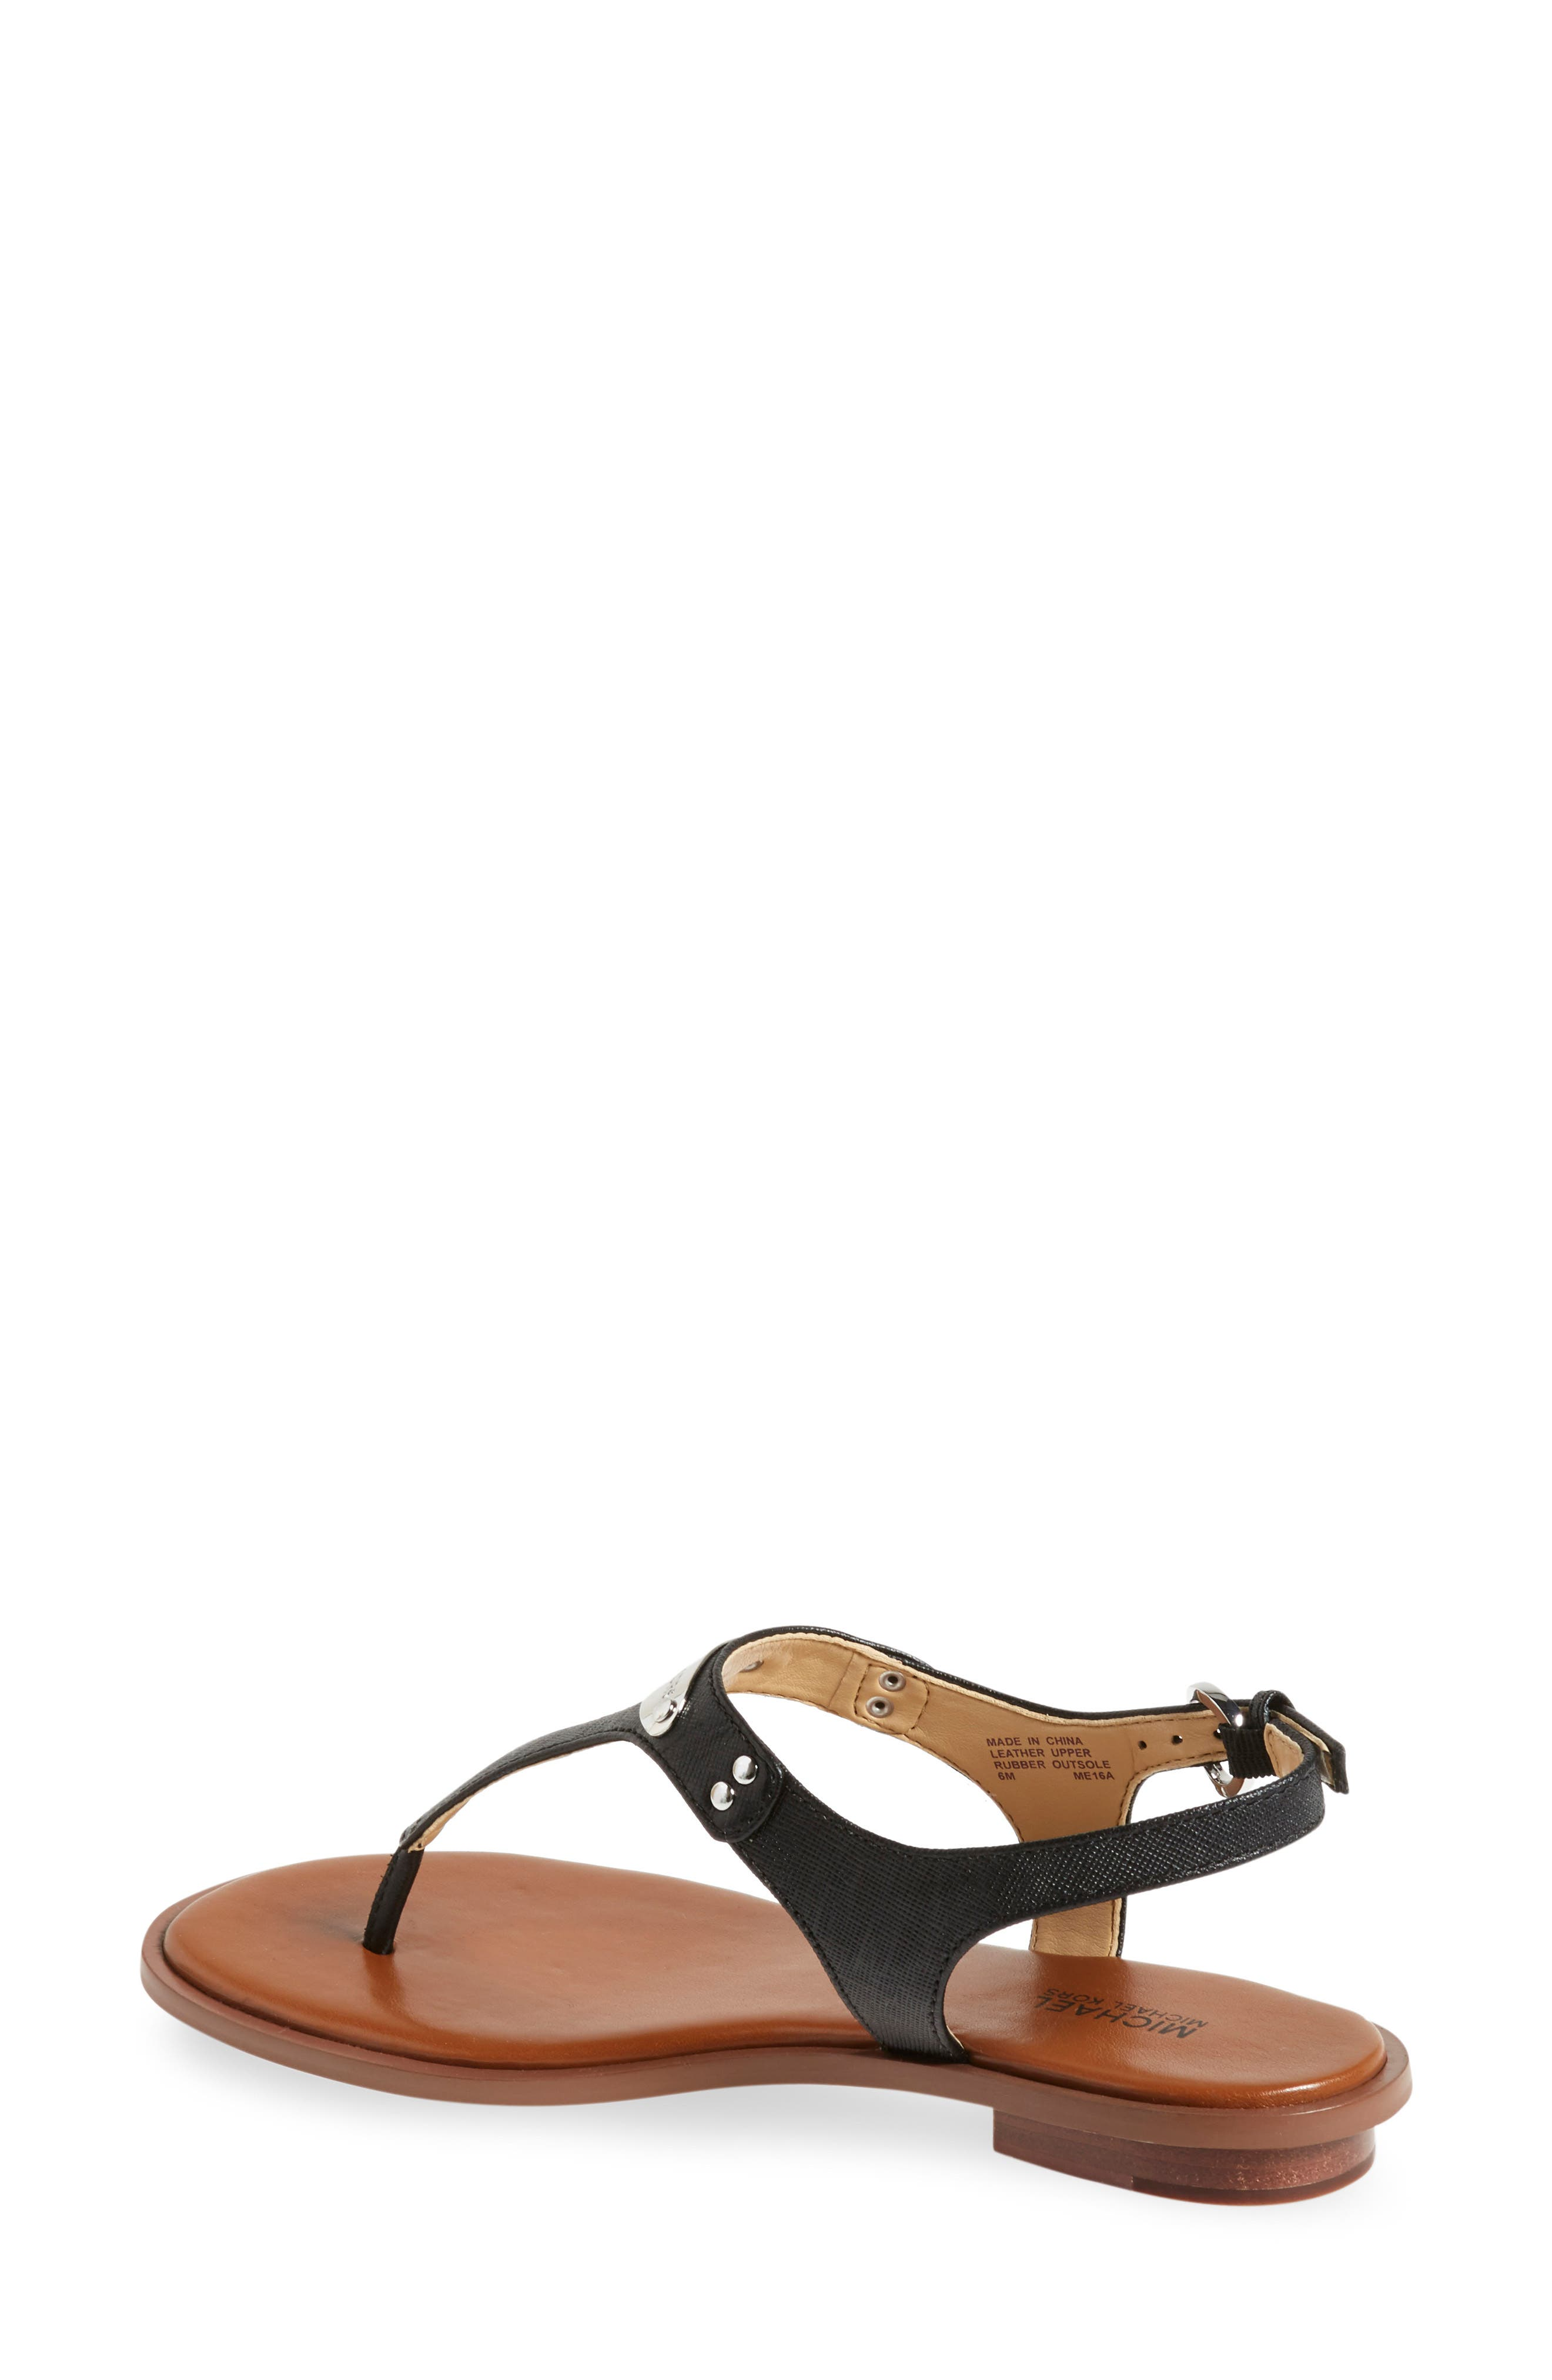 MICHAEL MICHAEL KORS 'Plate' Sandal, Main, color, BLACK